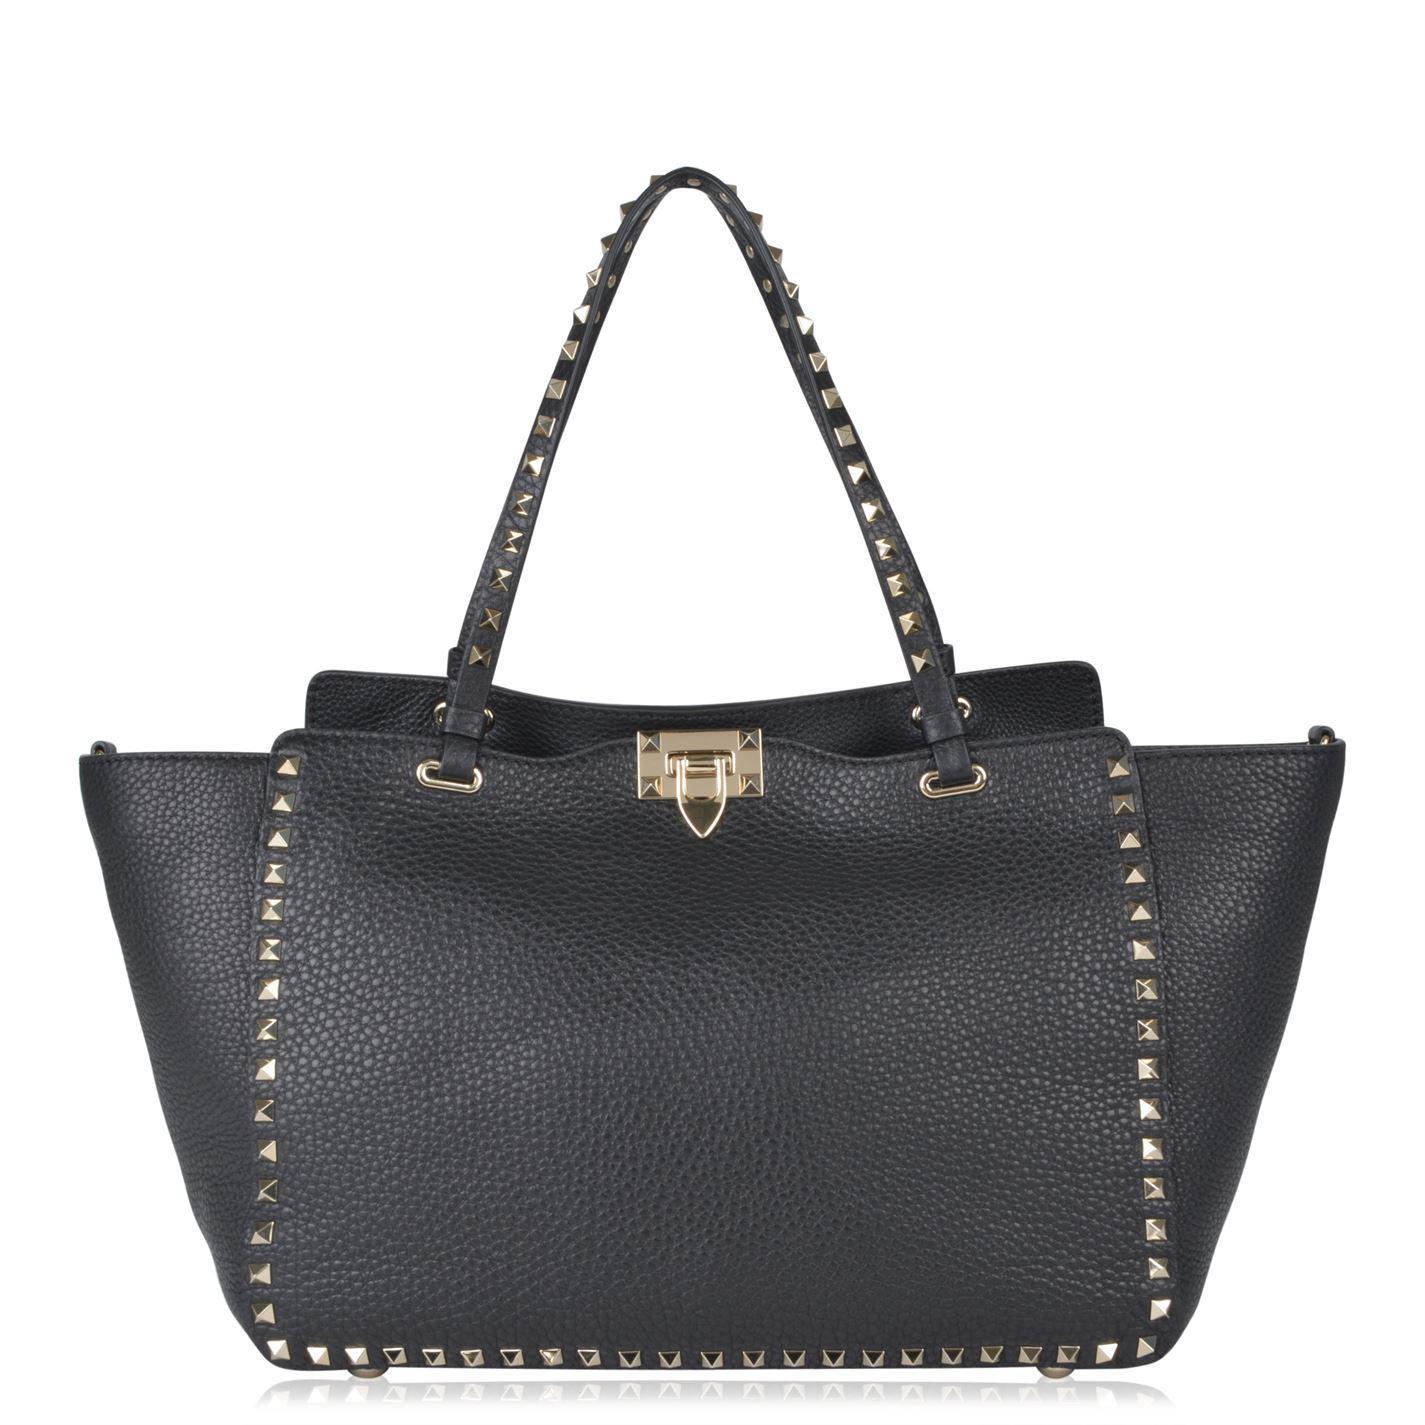 91690aa72 Valentino Rockstud Shopper Tote Bag in Black - Lyst